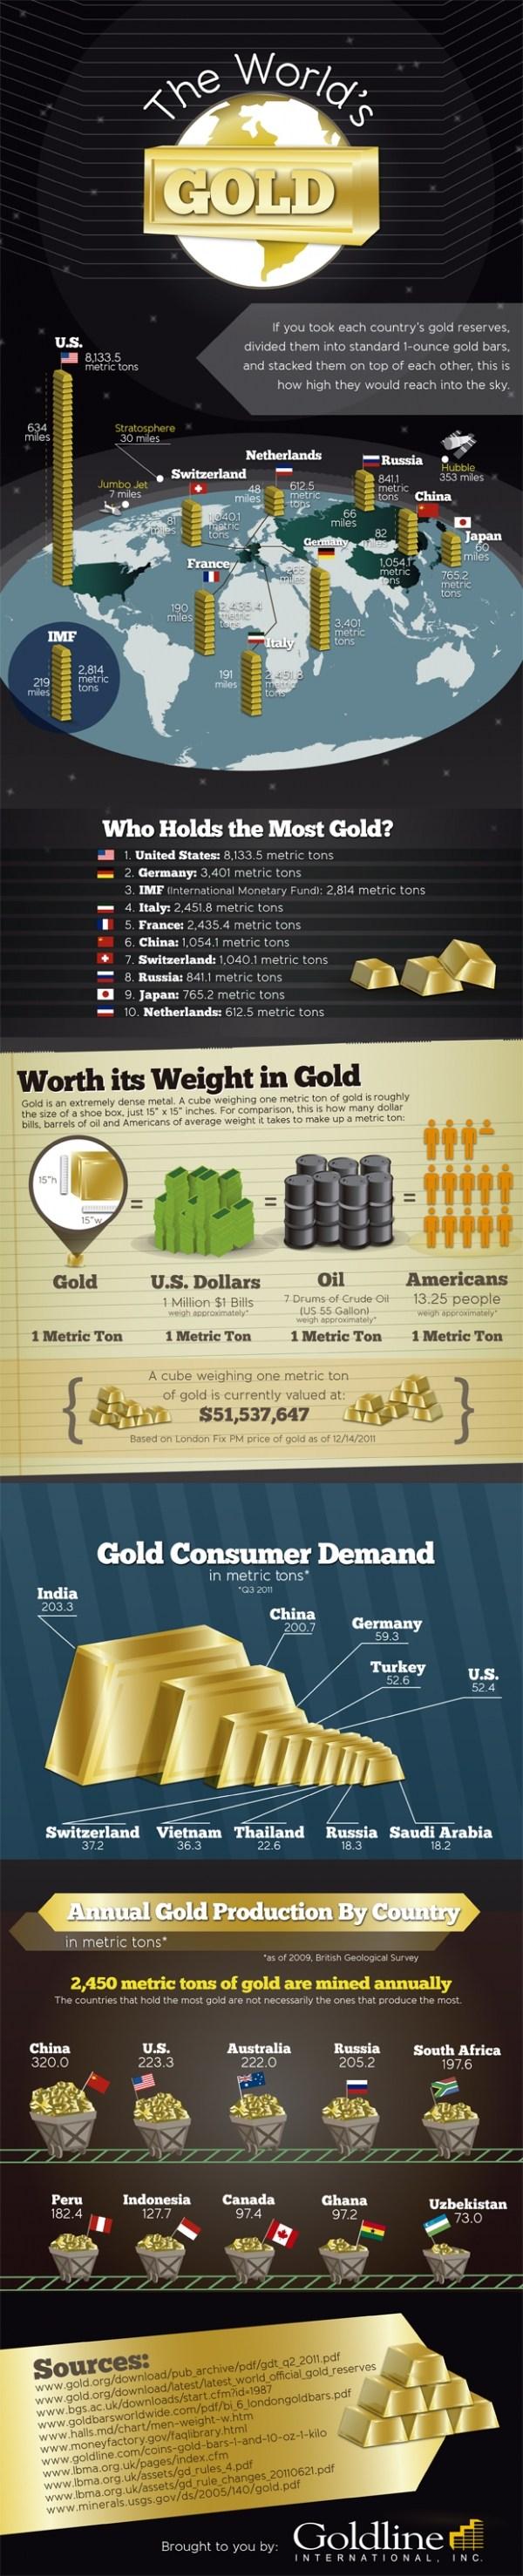 World's Gold Reserves Supply